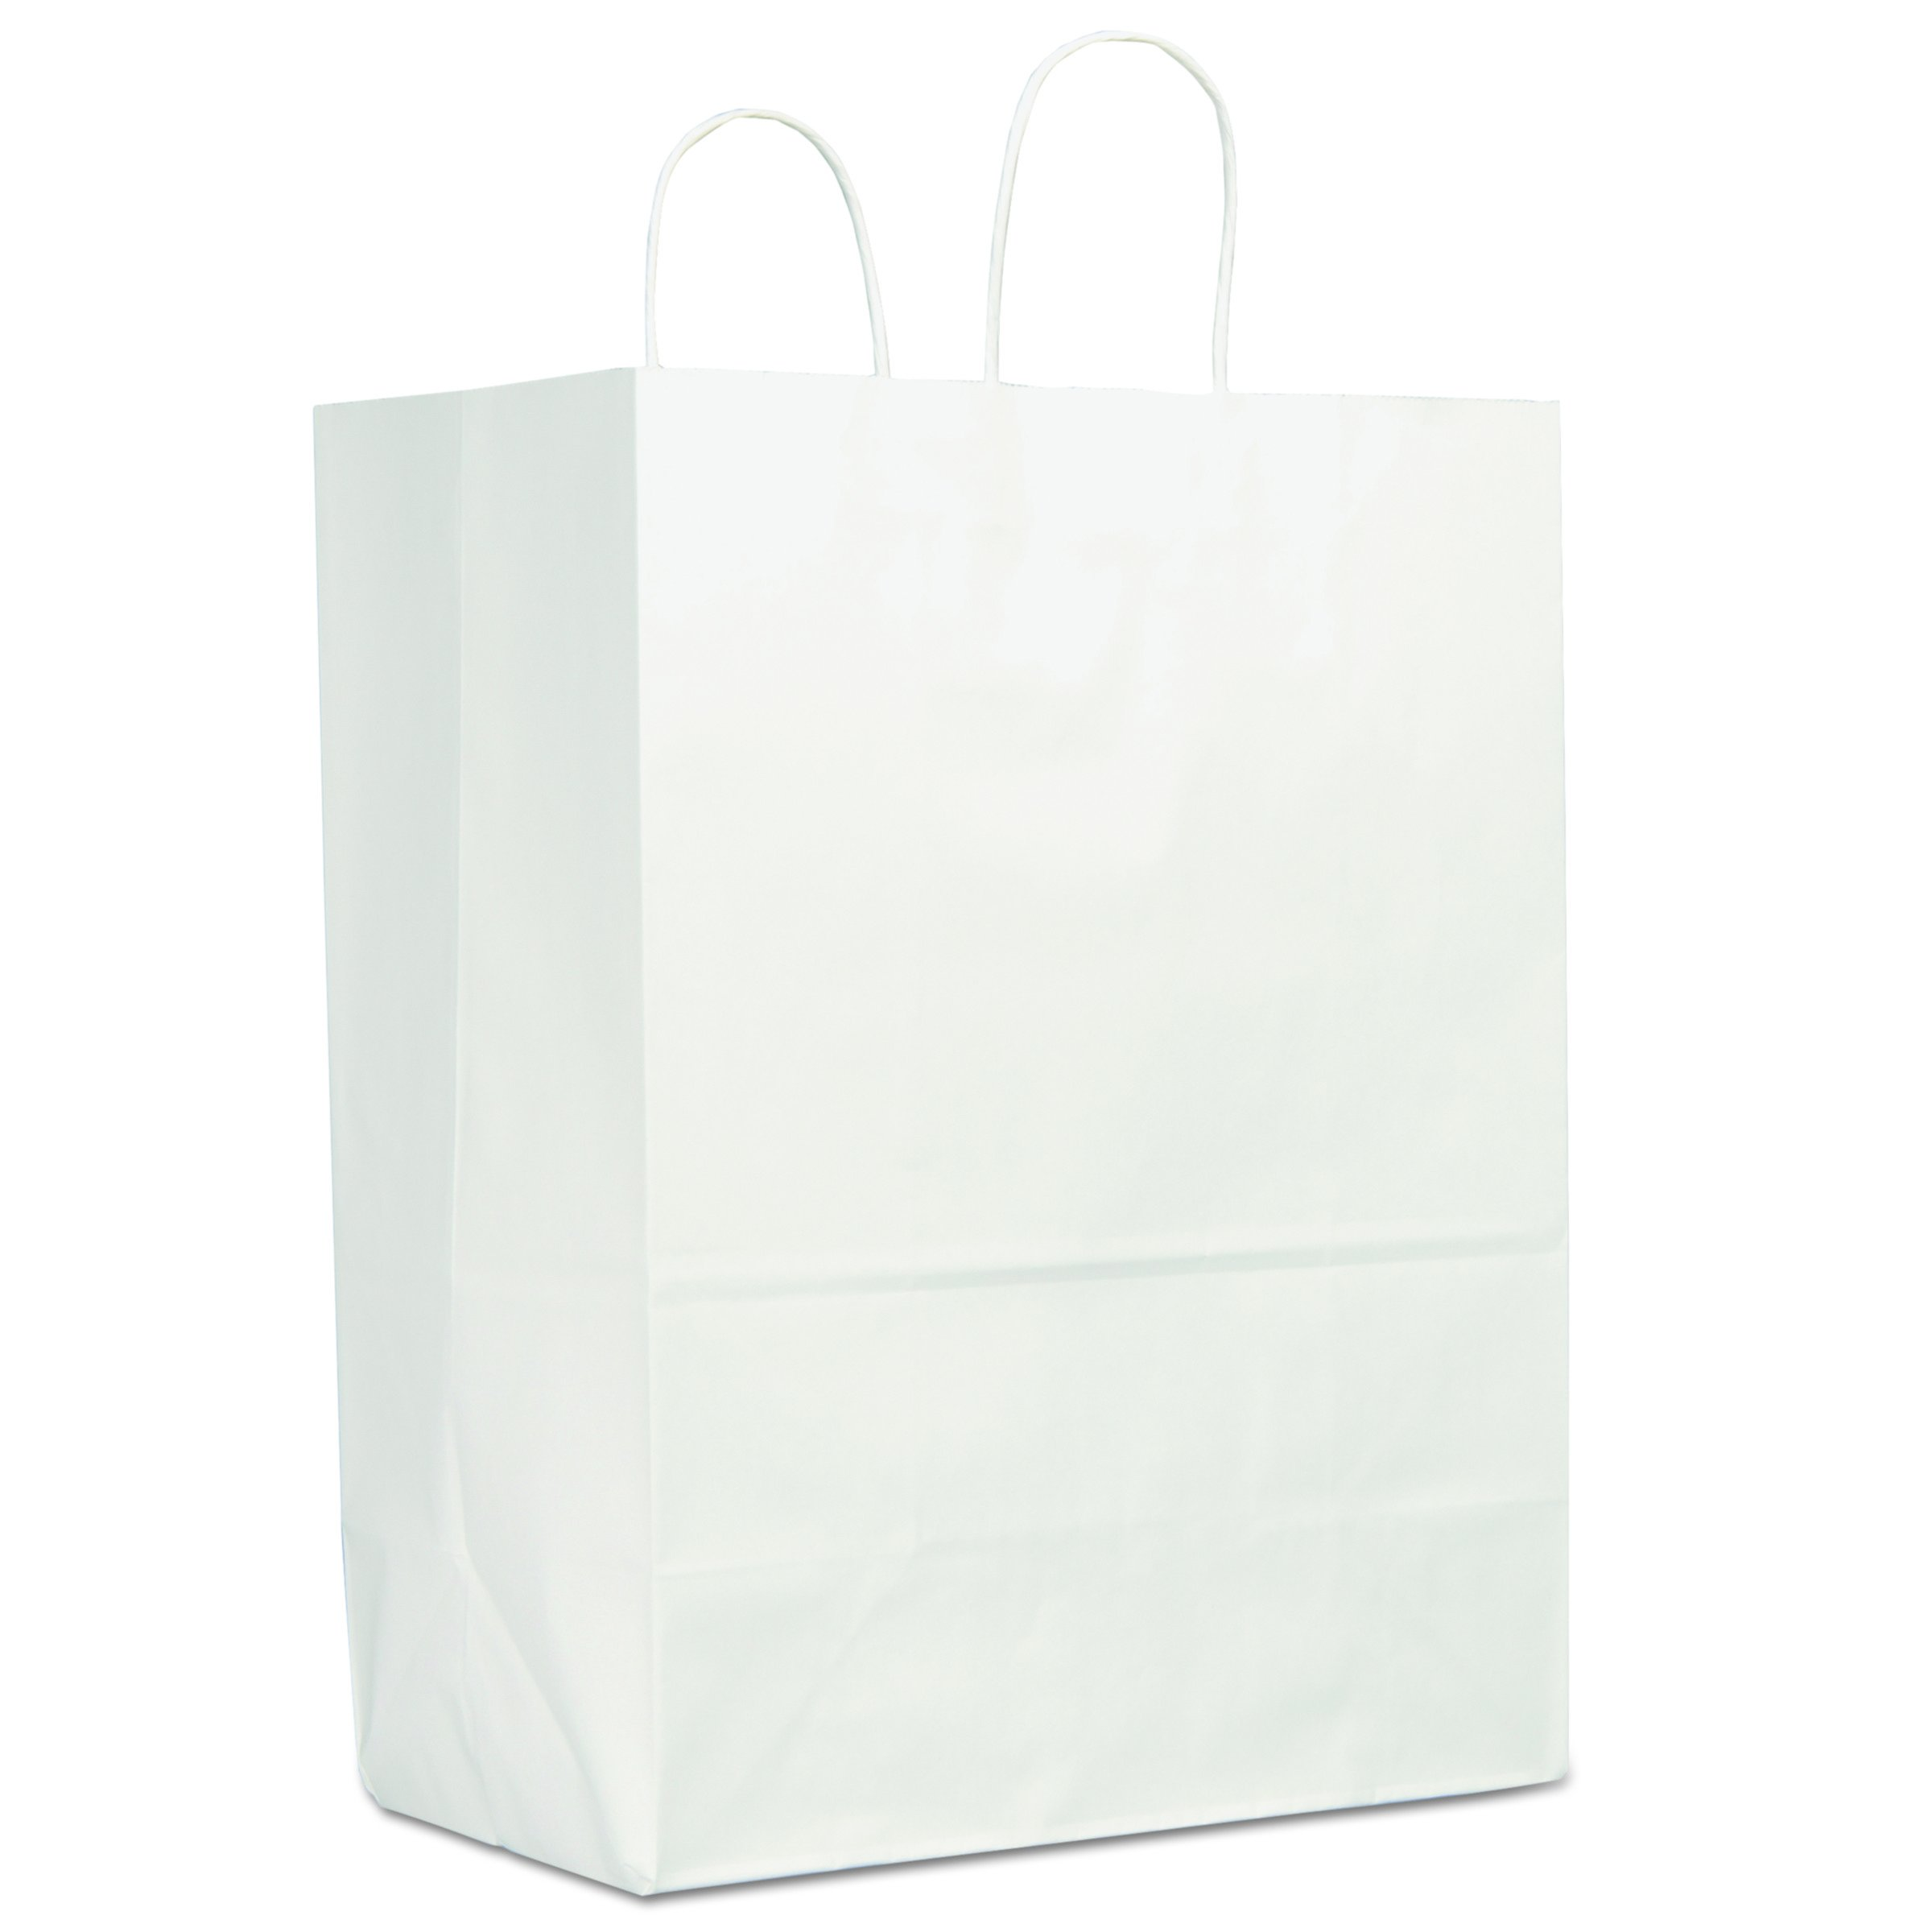 Duro WSHP13717C 13'' Width x 7'' Gusset x 17'' Height, White Sup-R-Mart Shopping Bag (250 per Bundle)